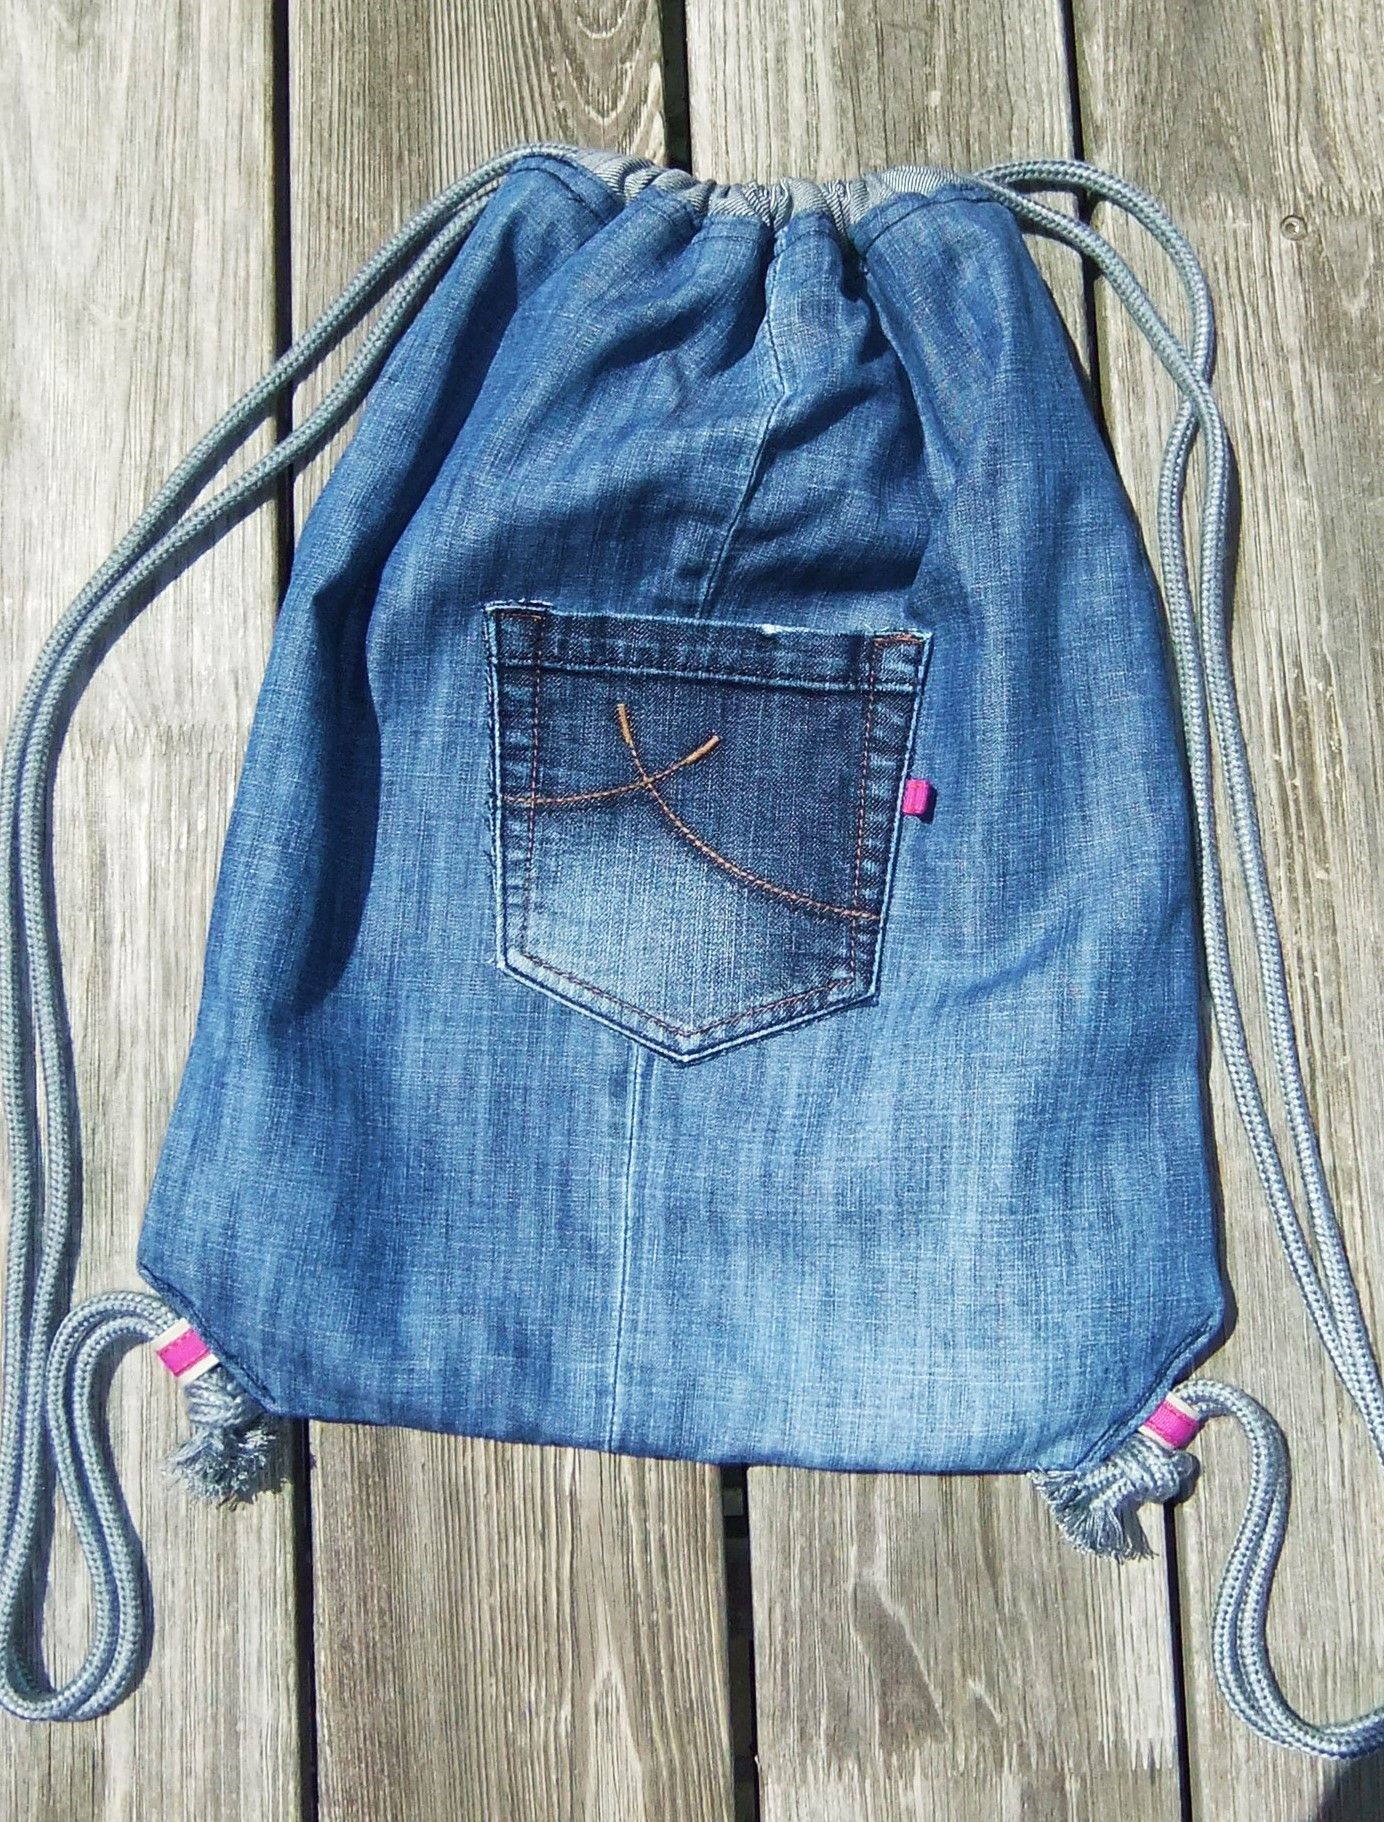 denim jeans turnbeutel diy upcycling momma hazell quilting pinterest denim jeans and. Black Bedroom Furniture Sets. Home Design Ideas